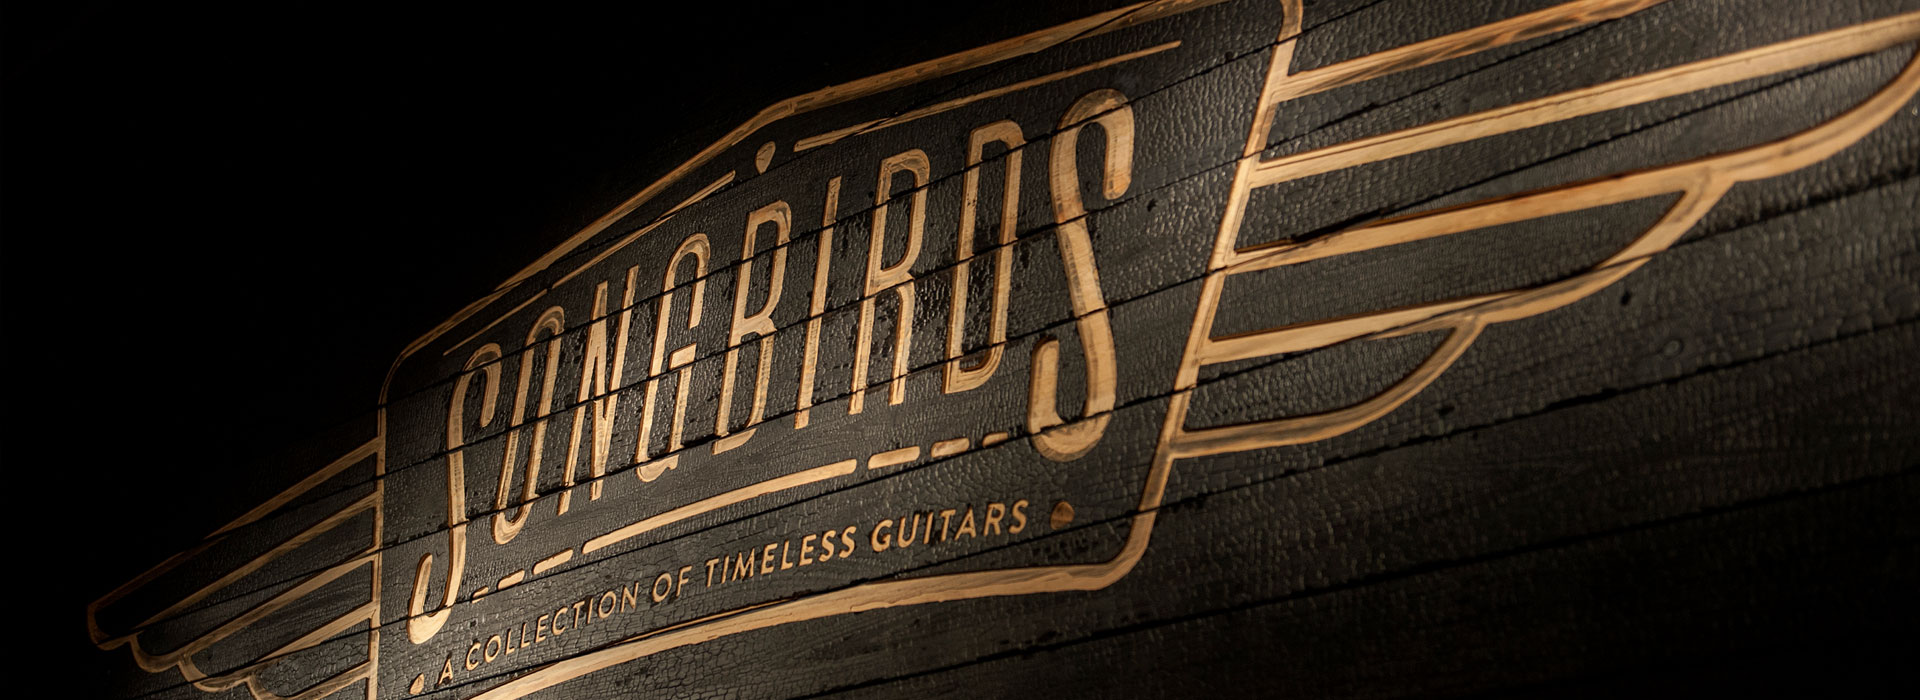 Songbirds Guitars - Branding, Identity, Logos, Brand Assets